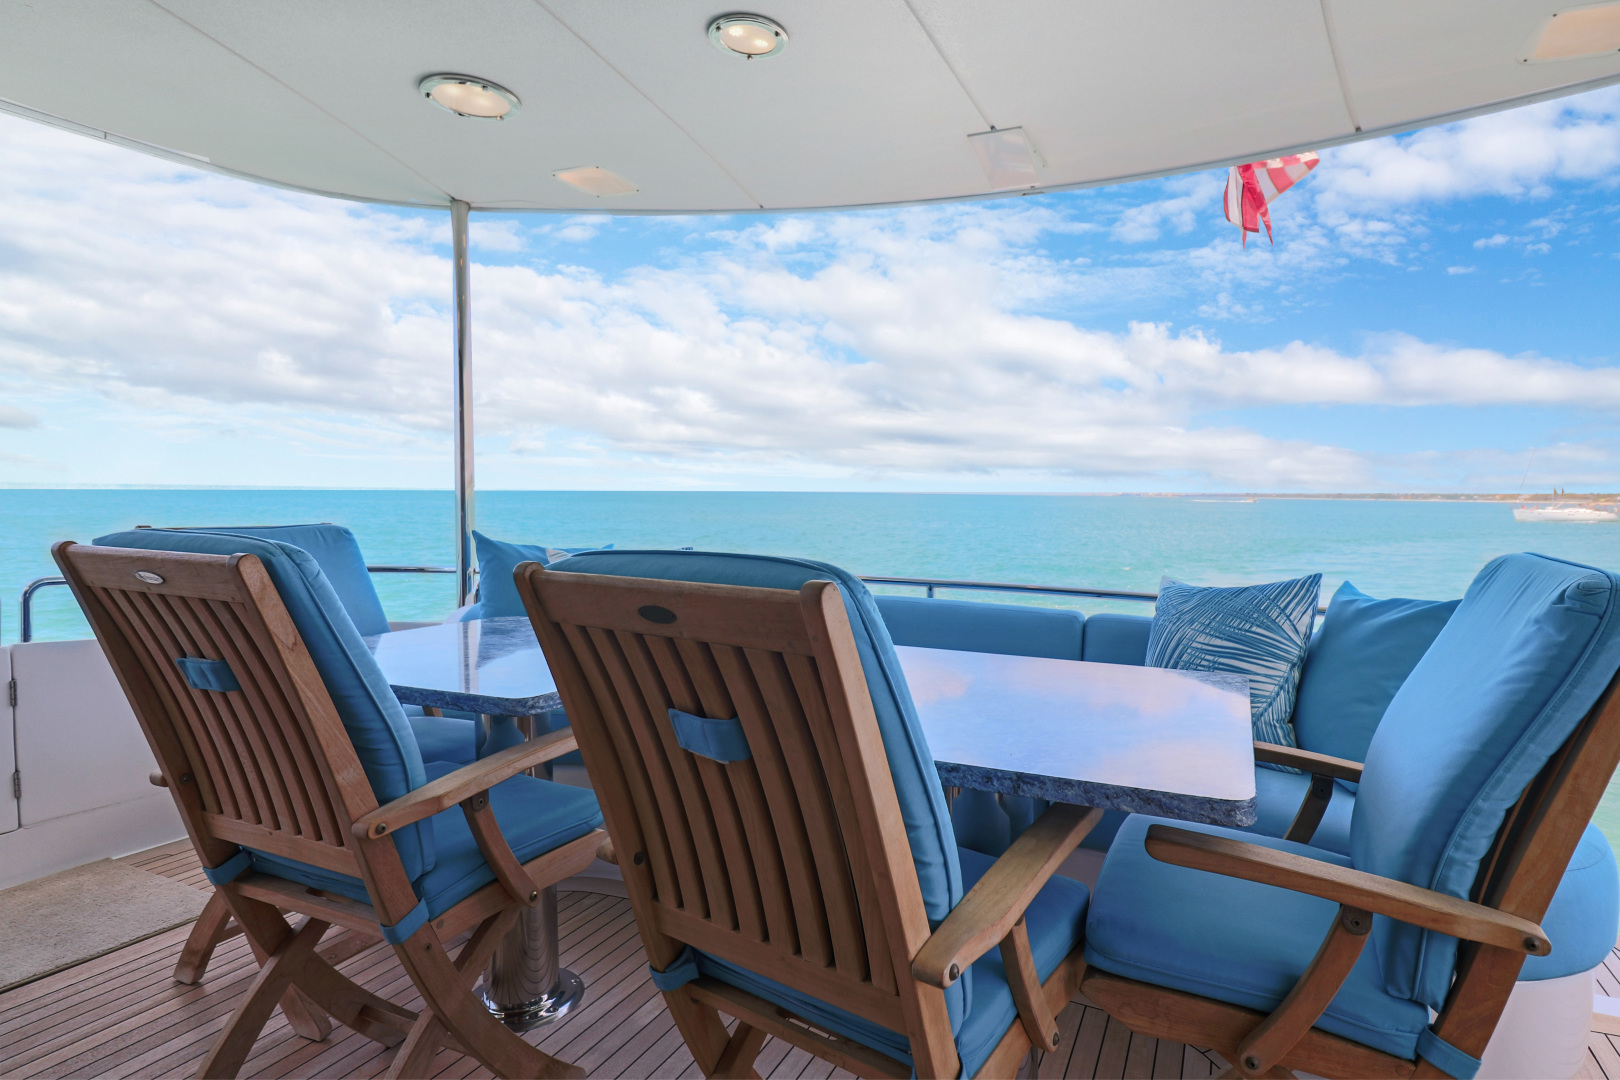 Lazzara-Sky Lounge 2002-Sea Bear Florida-United States-1419716   Thumbnail